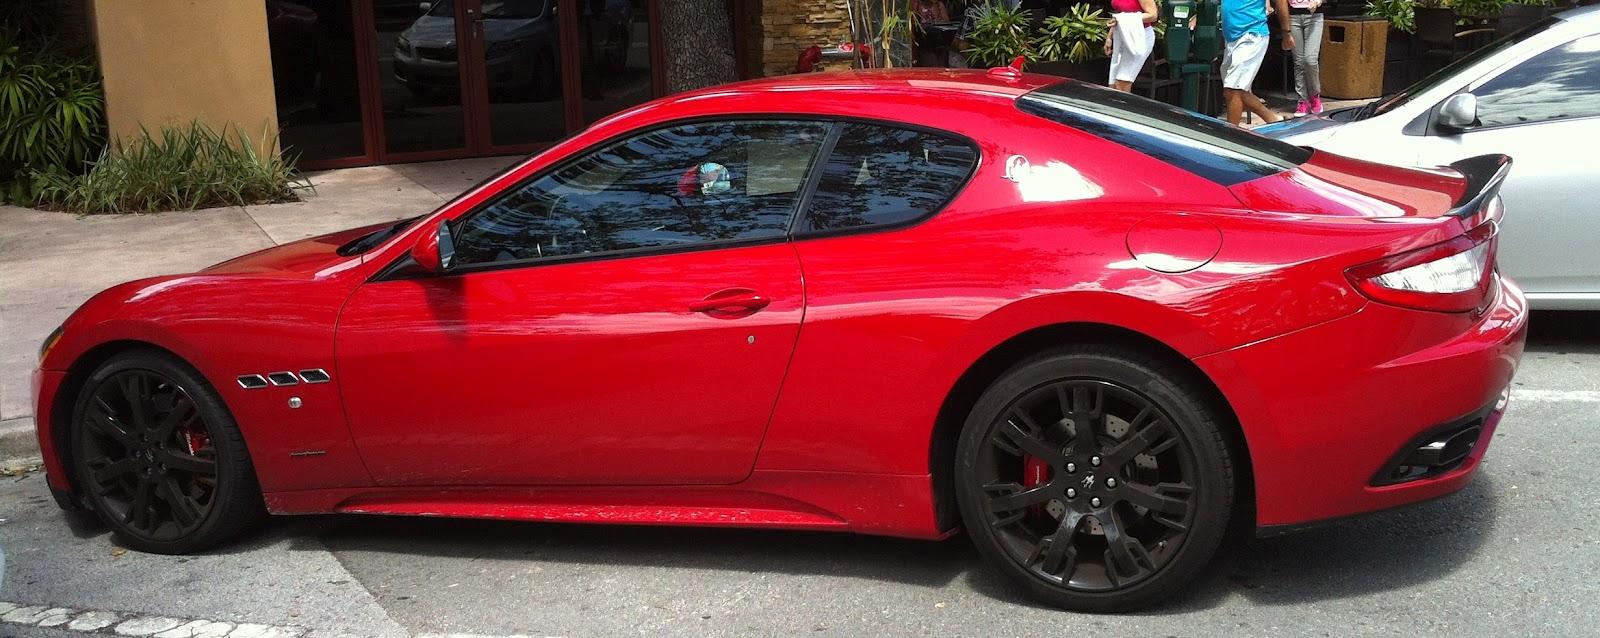 Red Maserati Granturismo In Coral Gables Exotic Cars On The Streets Of Miami